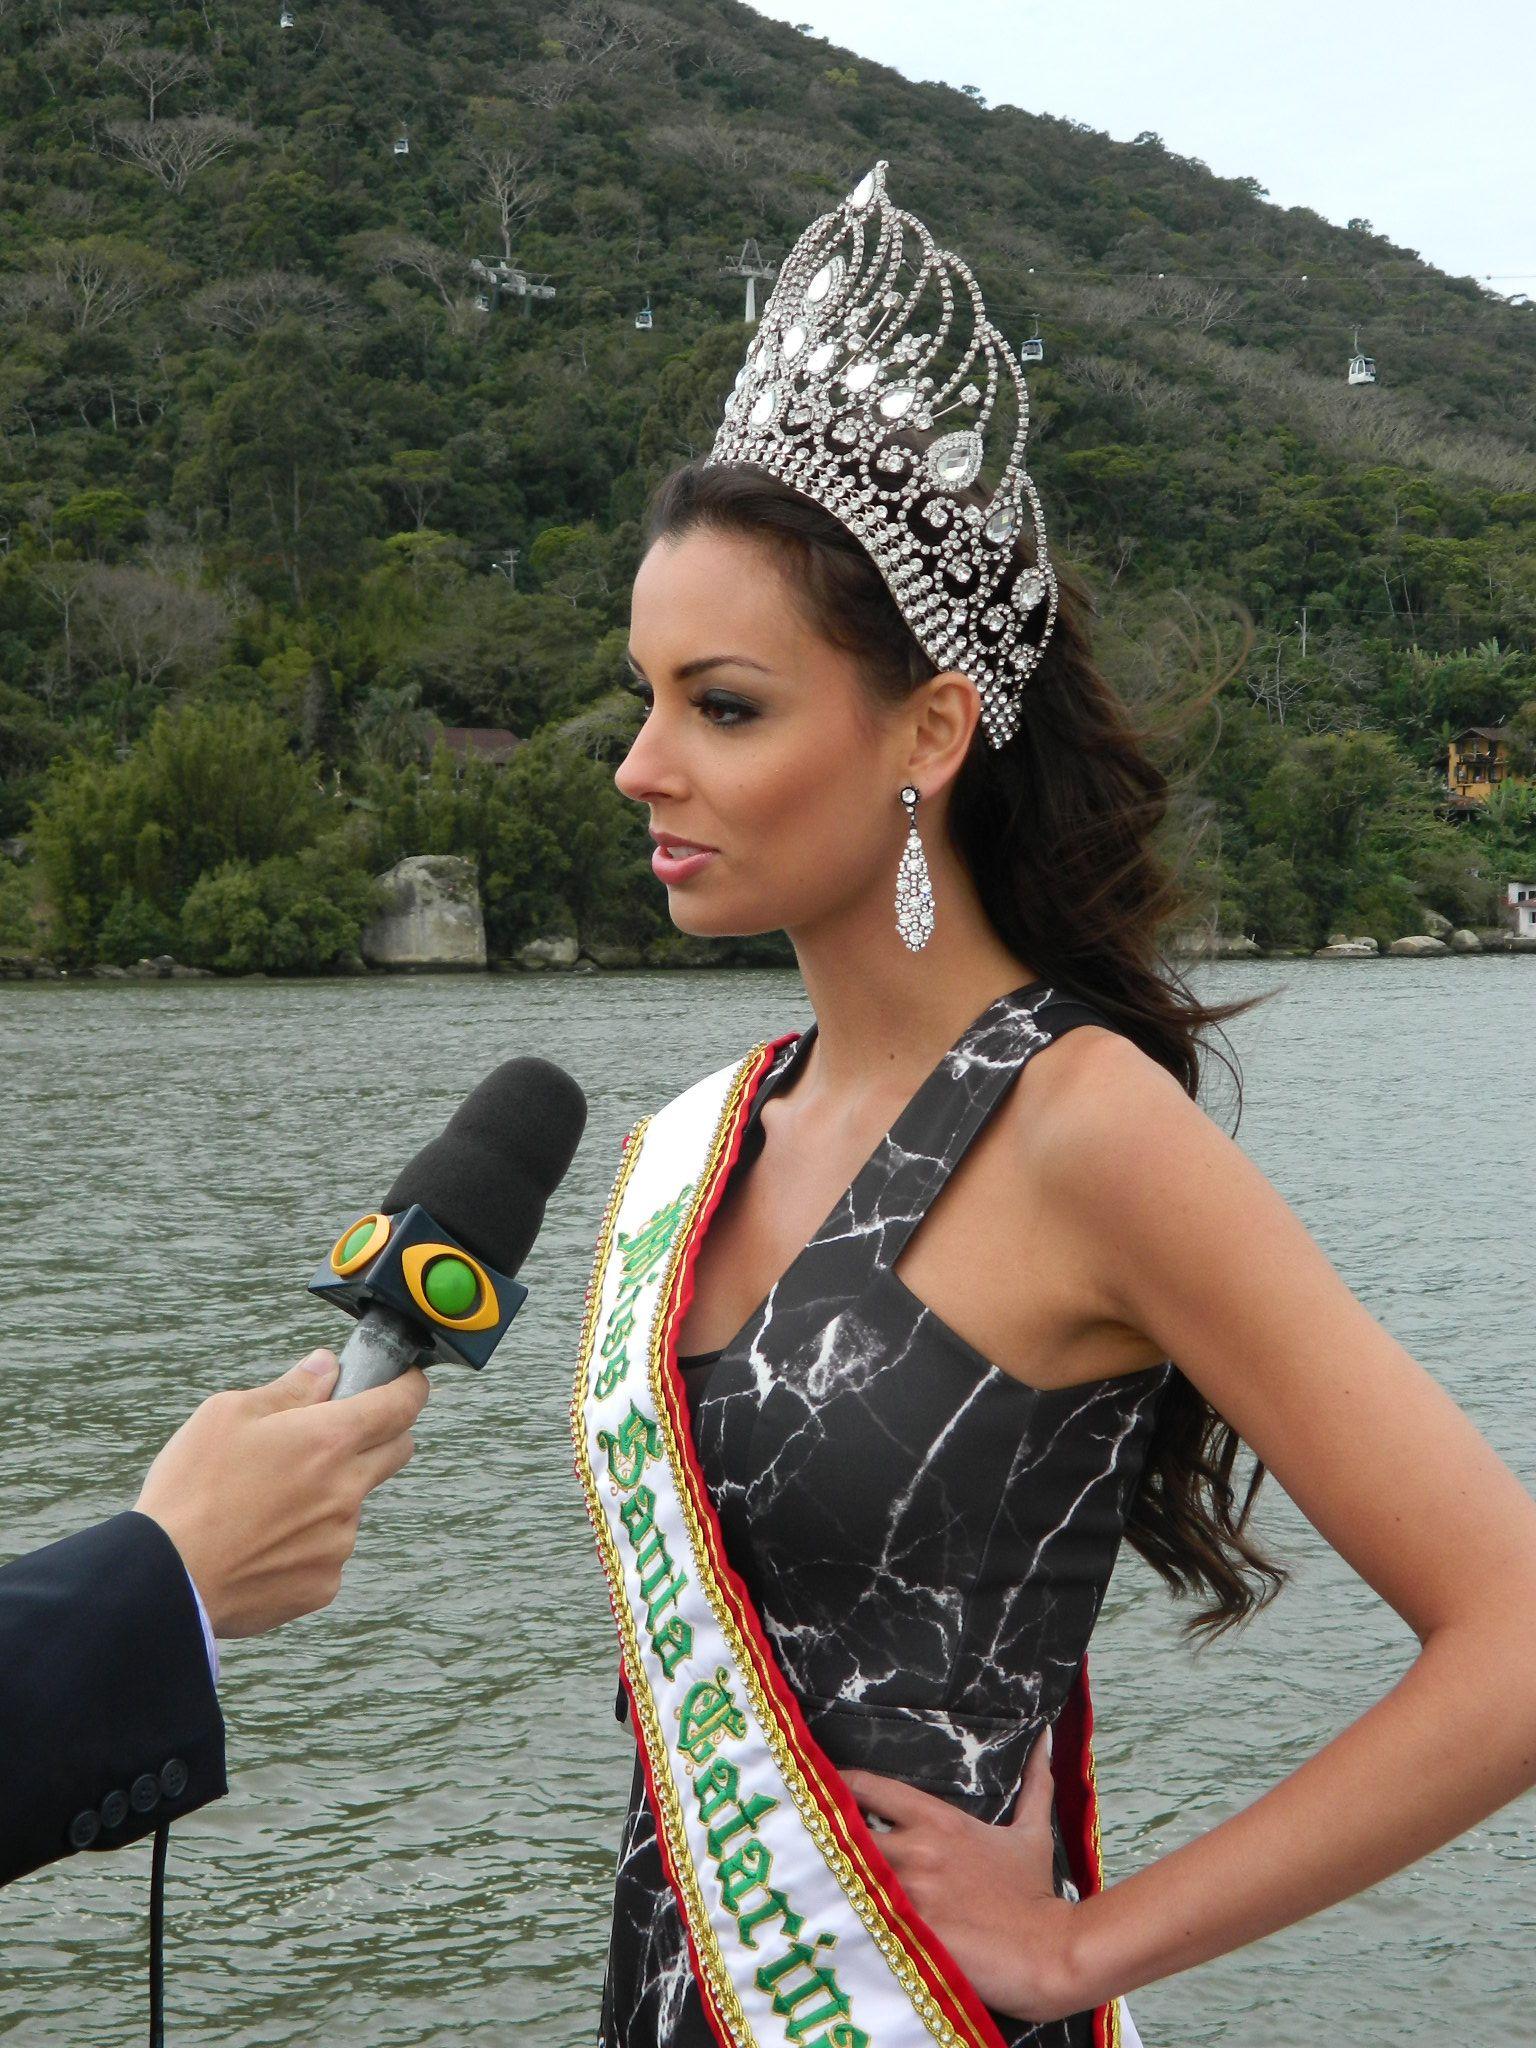 laura lopes, miss santa catarina 2014. - Página 2 Ztztw3xm